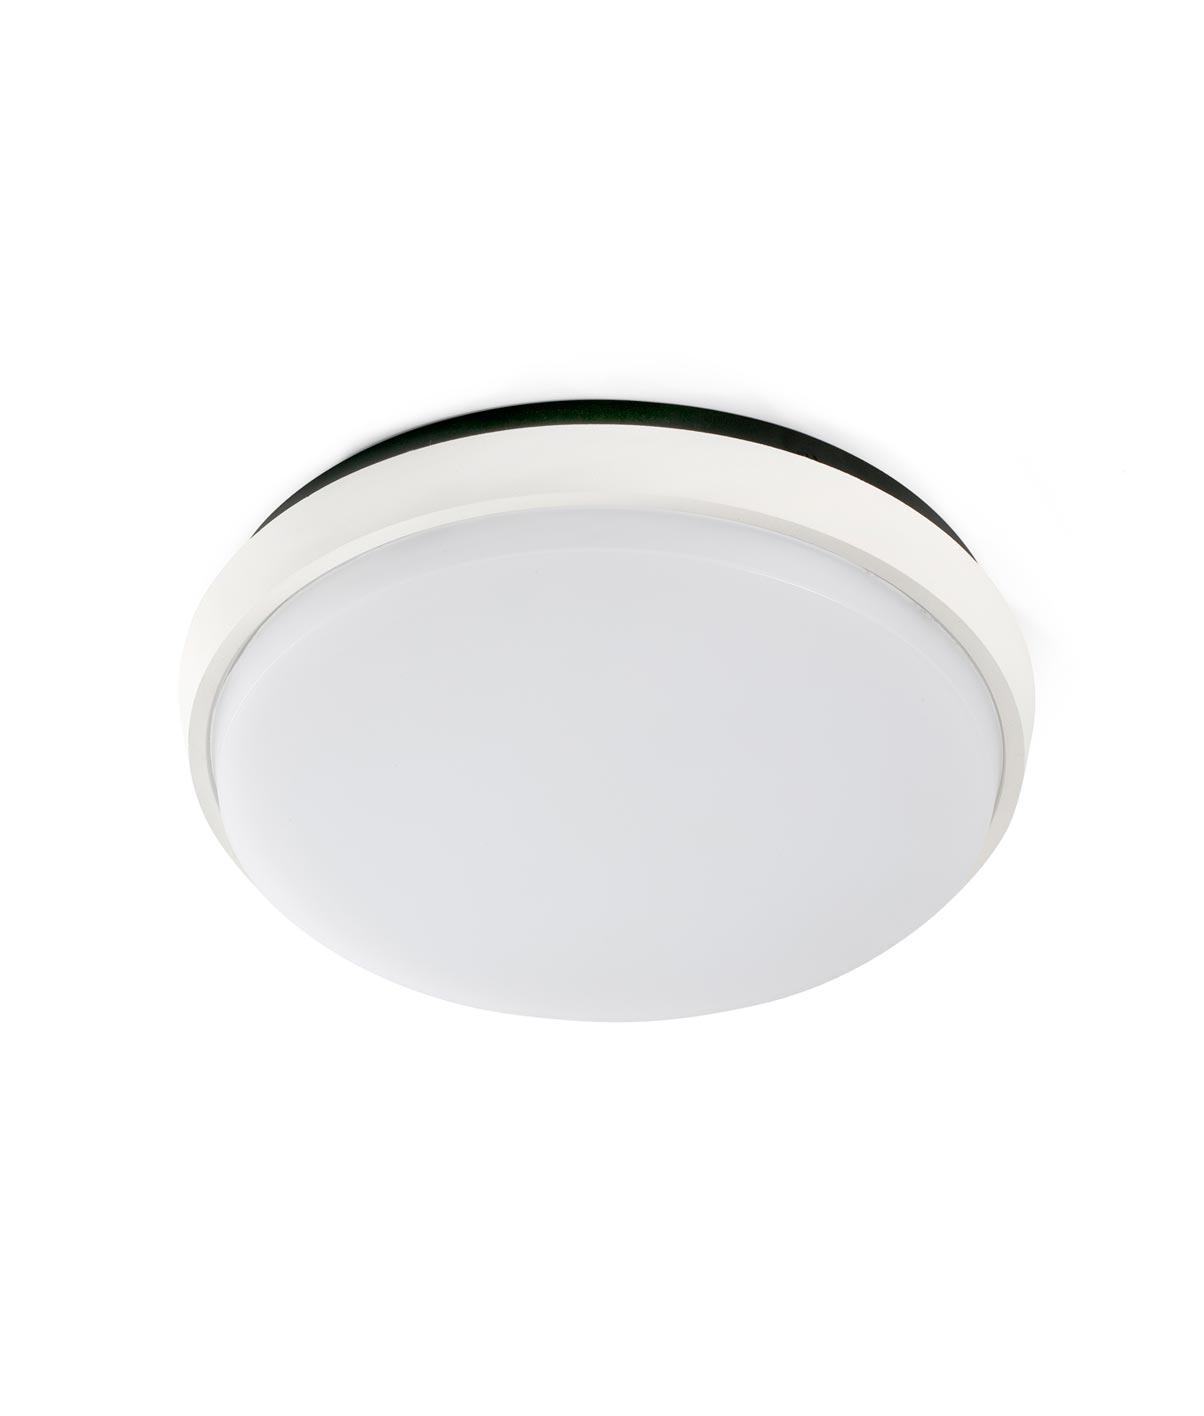 Plafón exterior LED MERA blanco